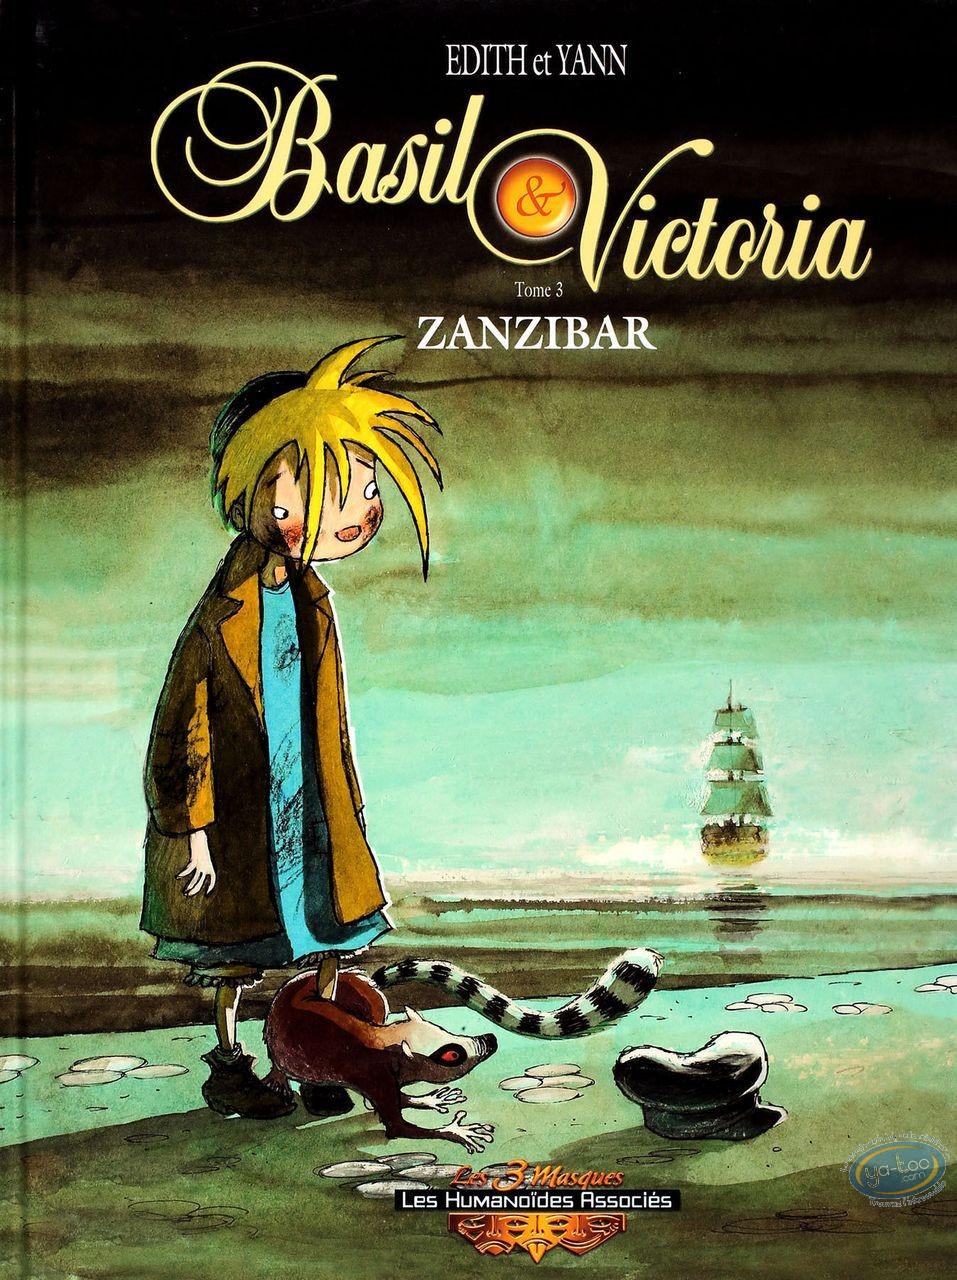 BD occasion, Basil et Victoria : Zanzibar